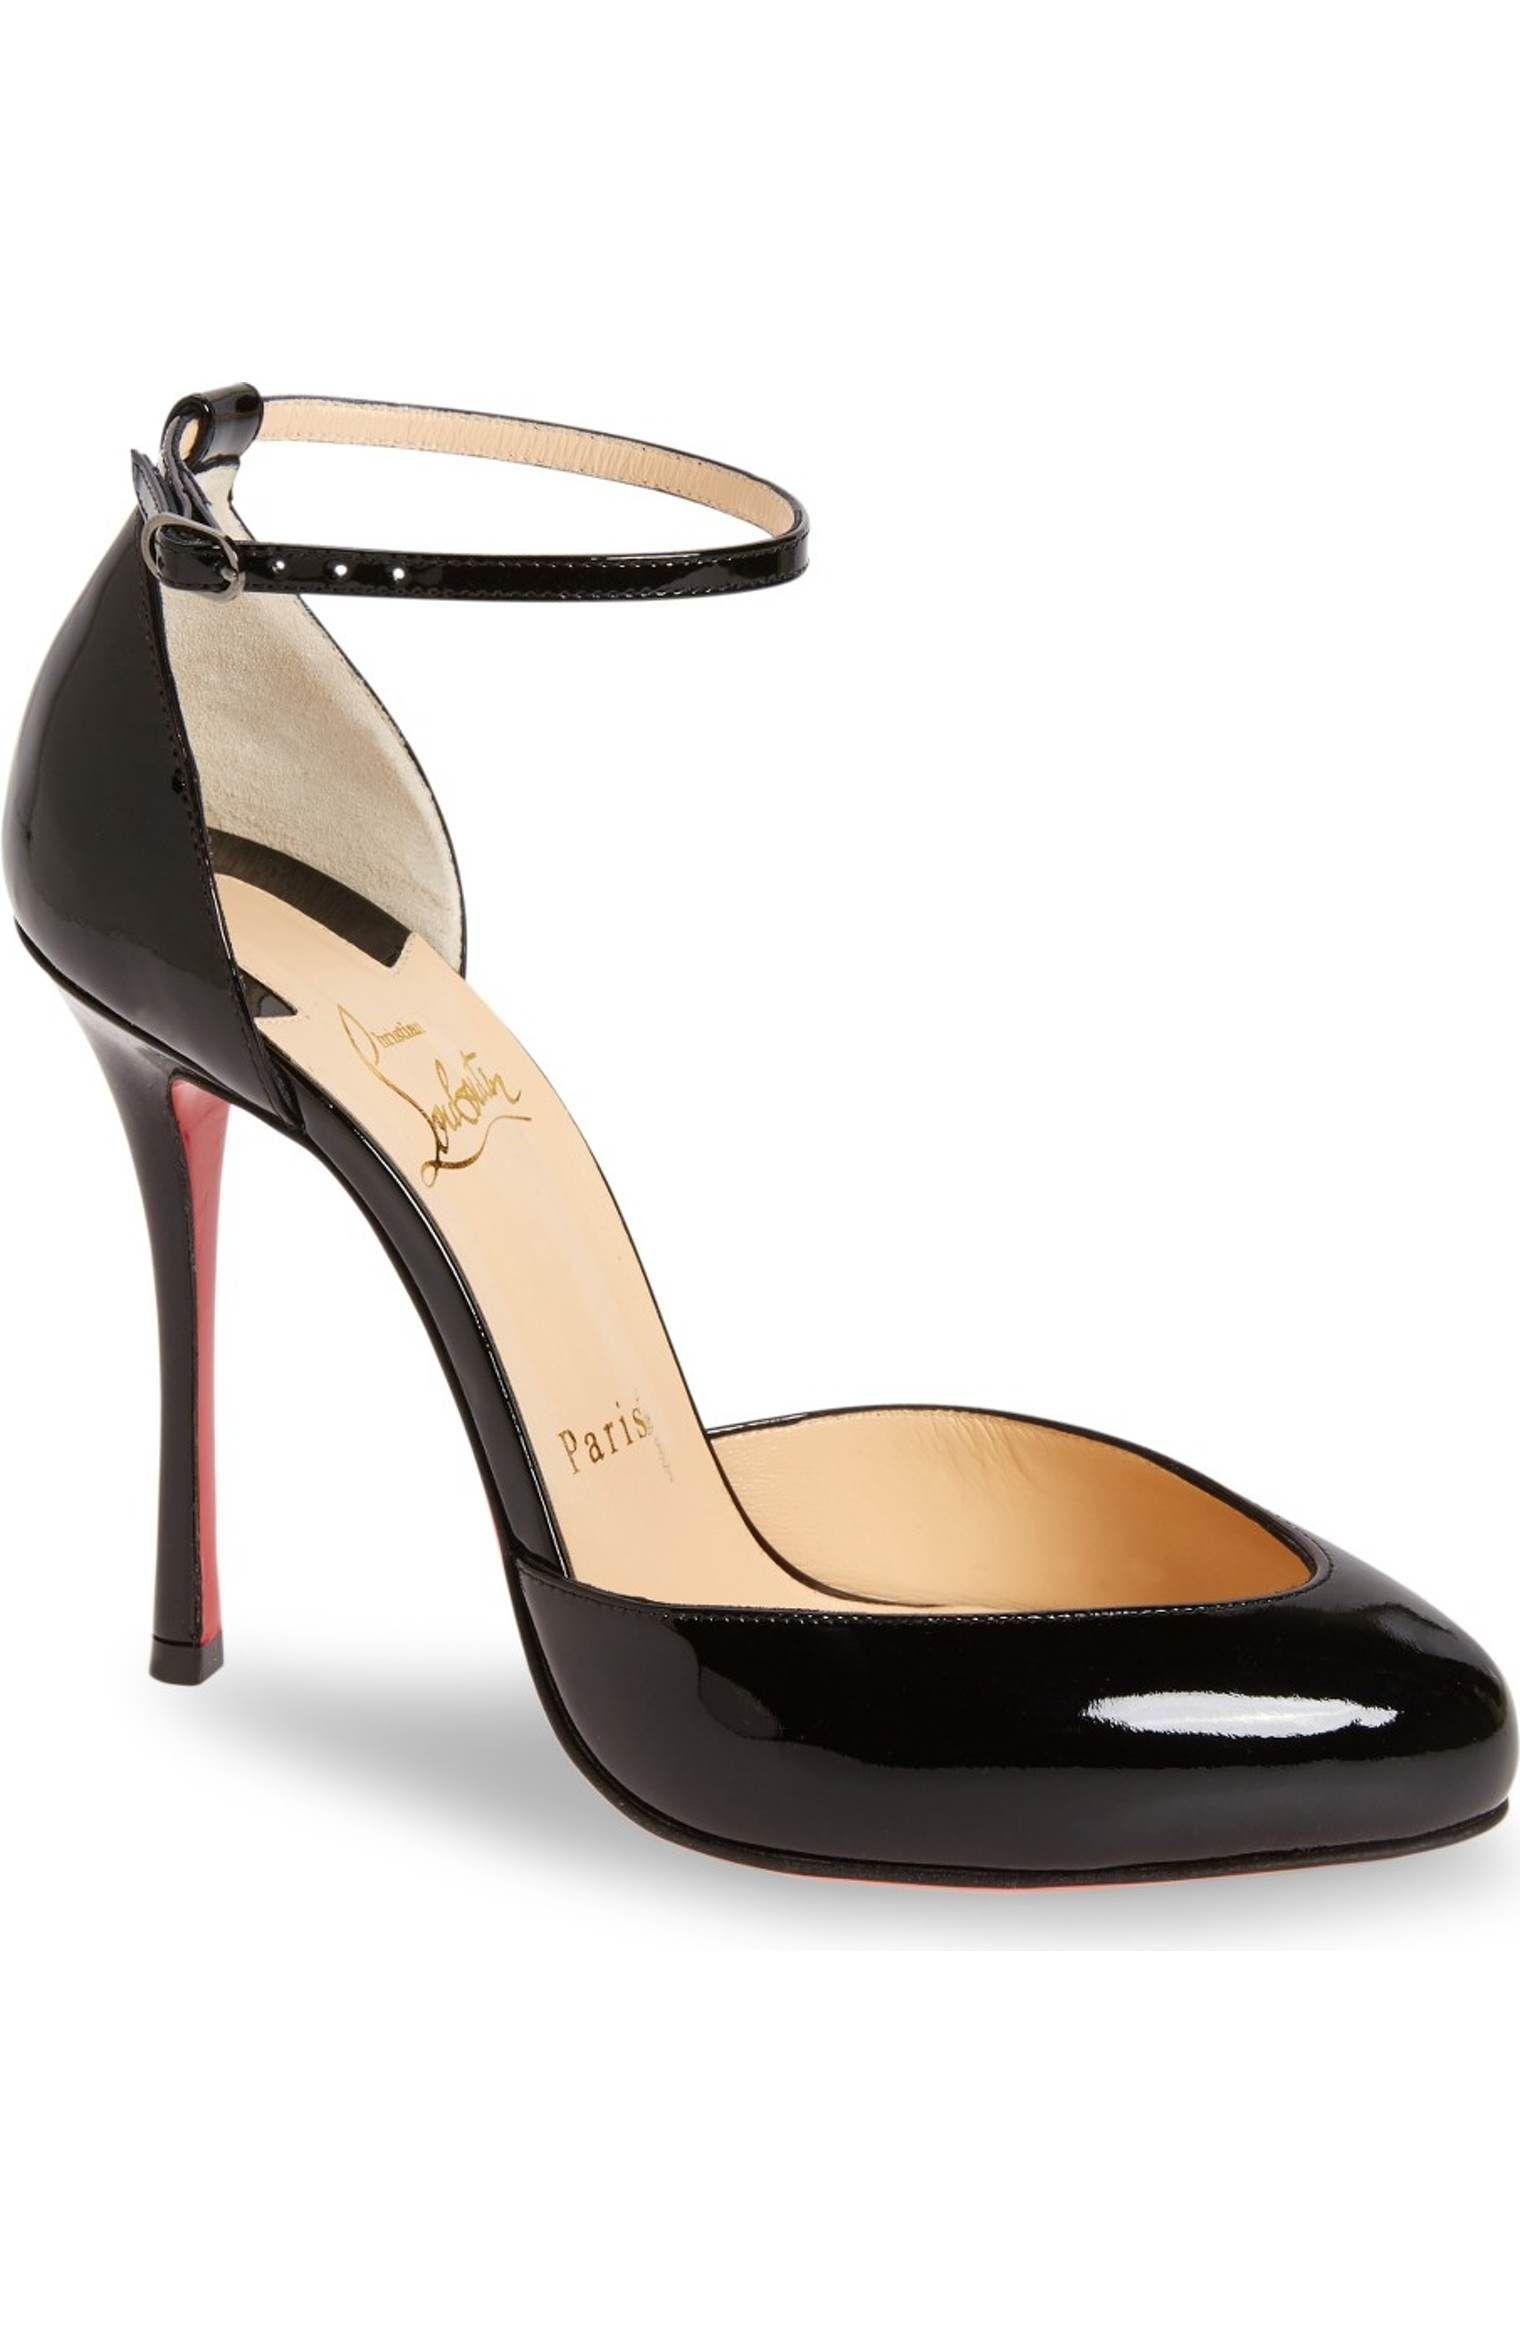 2b048baedabd Christian Louboutin  u201cDollyla u201d Low-Vamp Ankle-Strap Pumps in Black  Patent